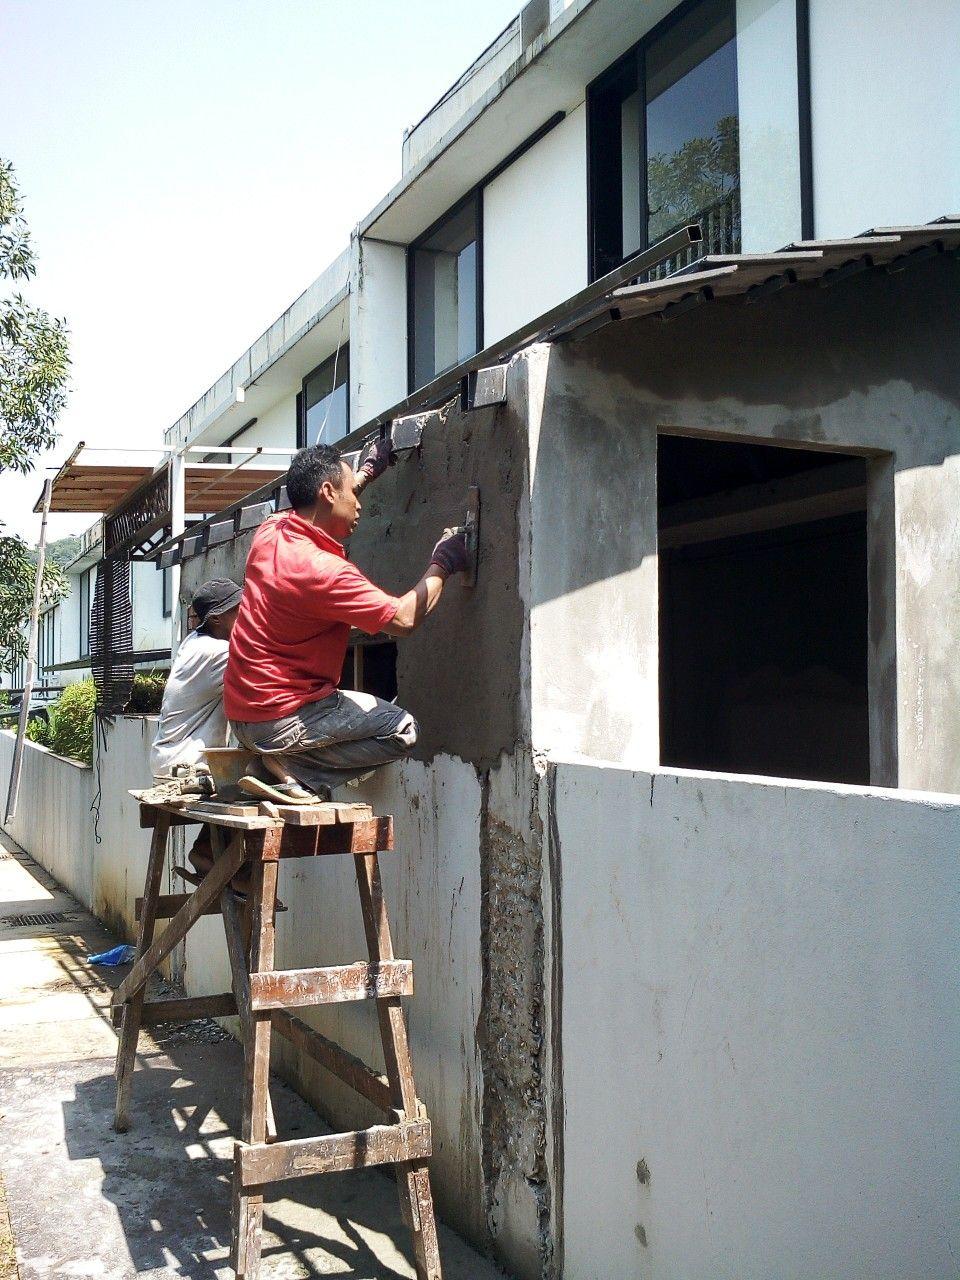 Extend Dapur Bandar Saujana Putra Plumber Repair Sungai Buloh Renovation Service